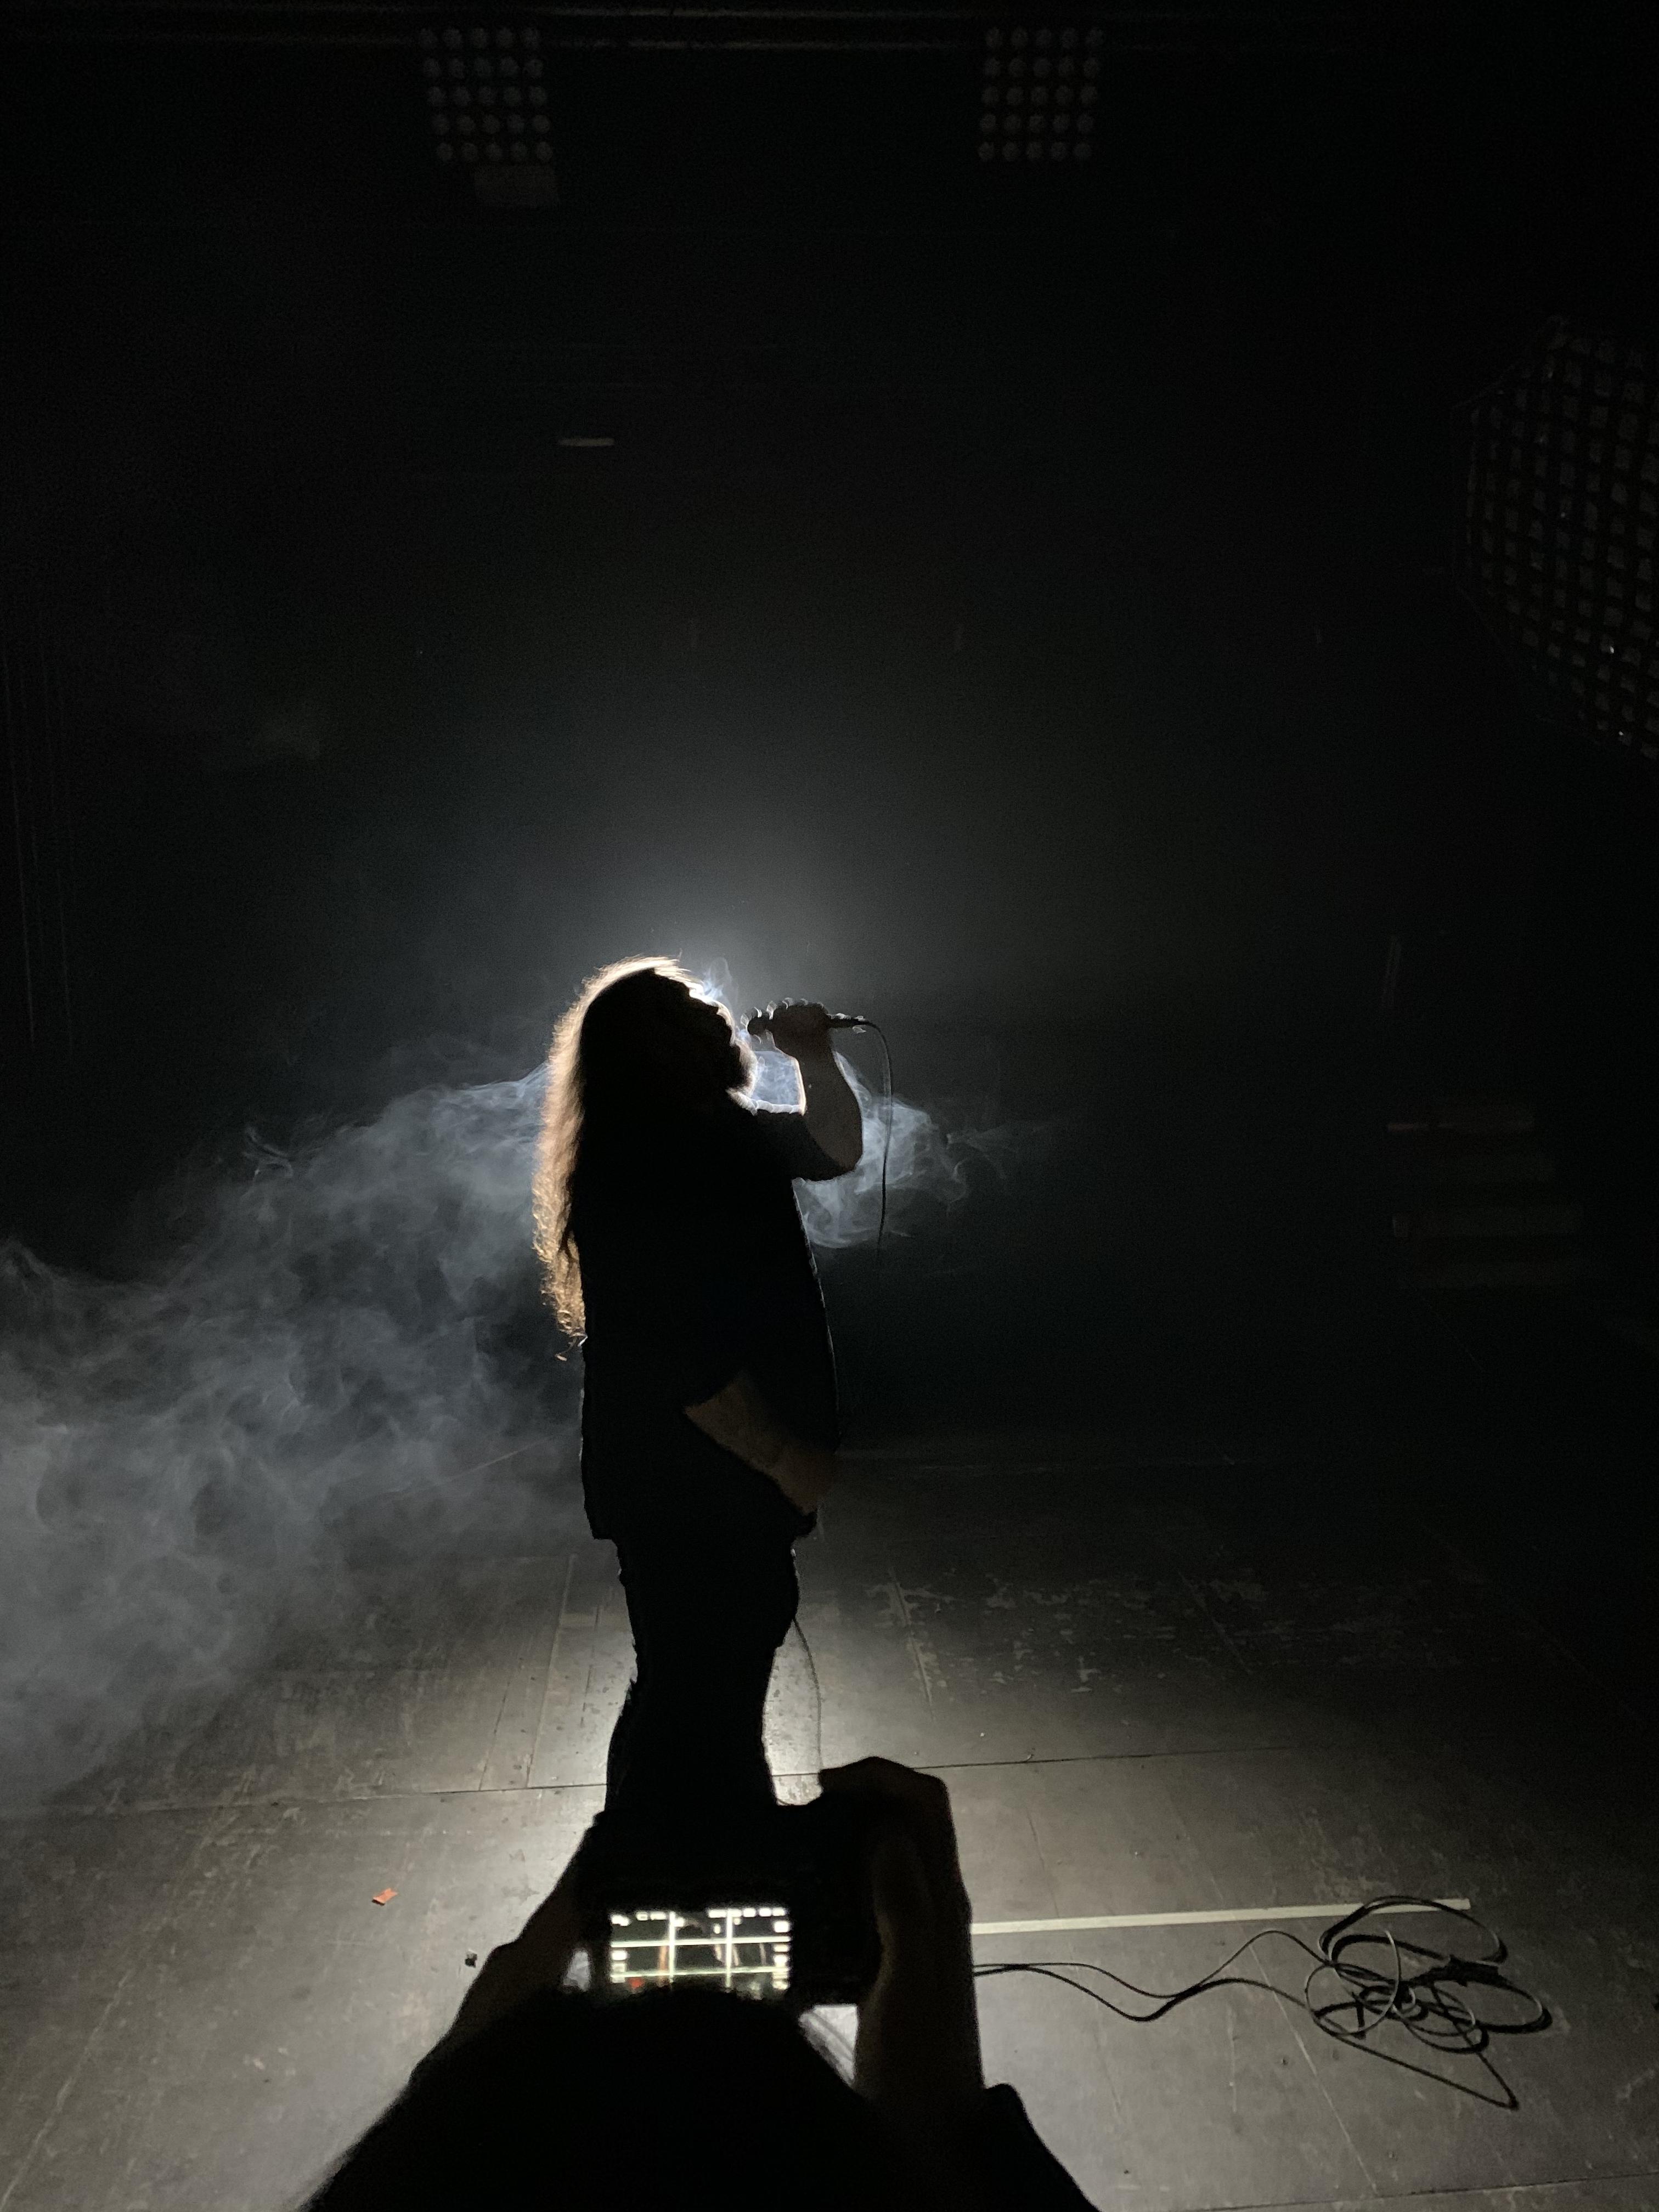 The-Very-End-Metal-Video-Shoot-behind-the-scenes_5641